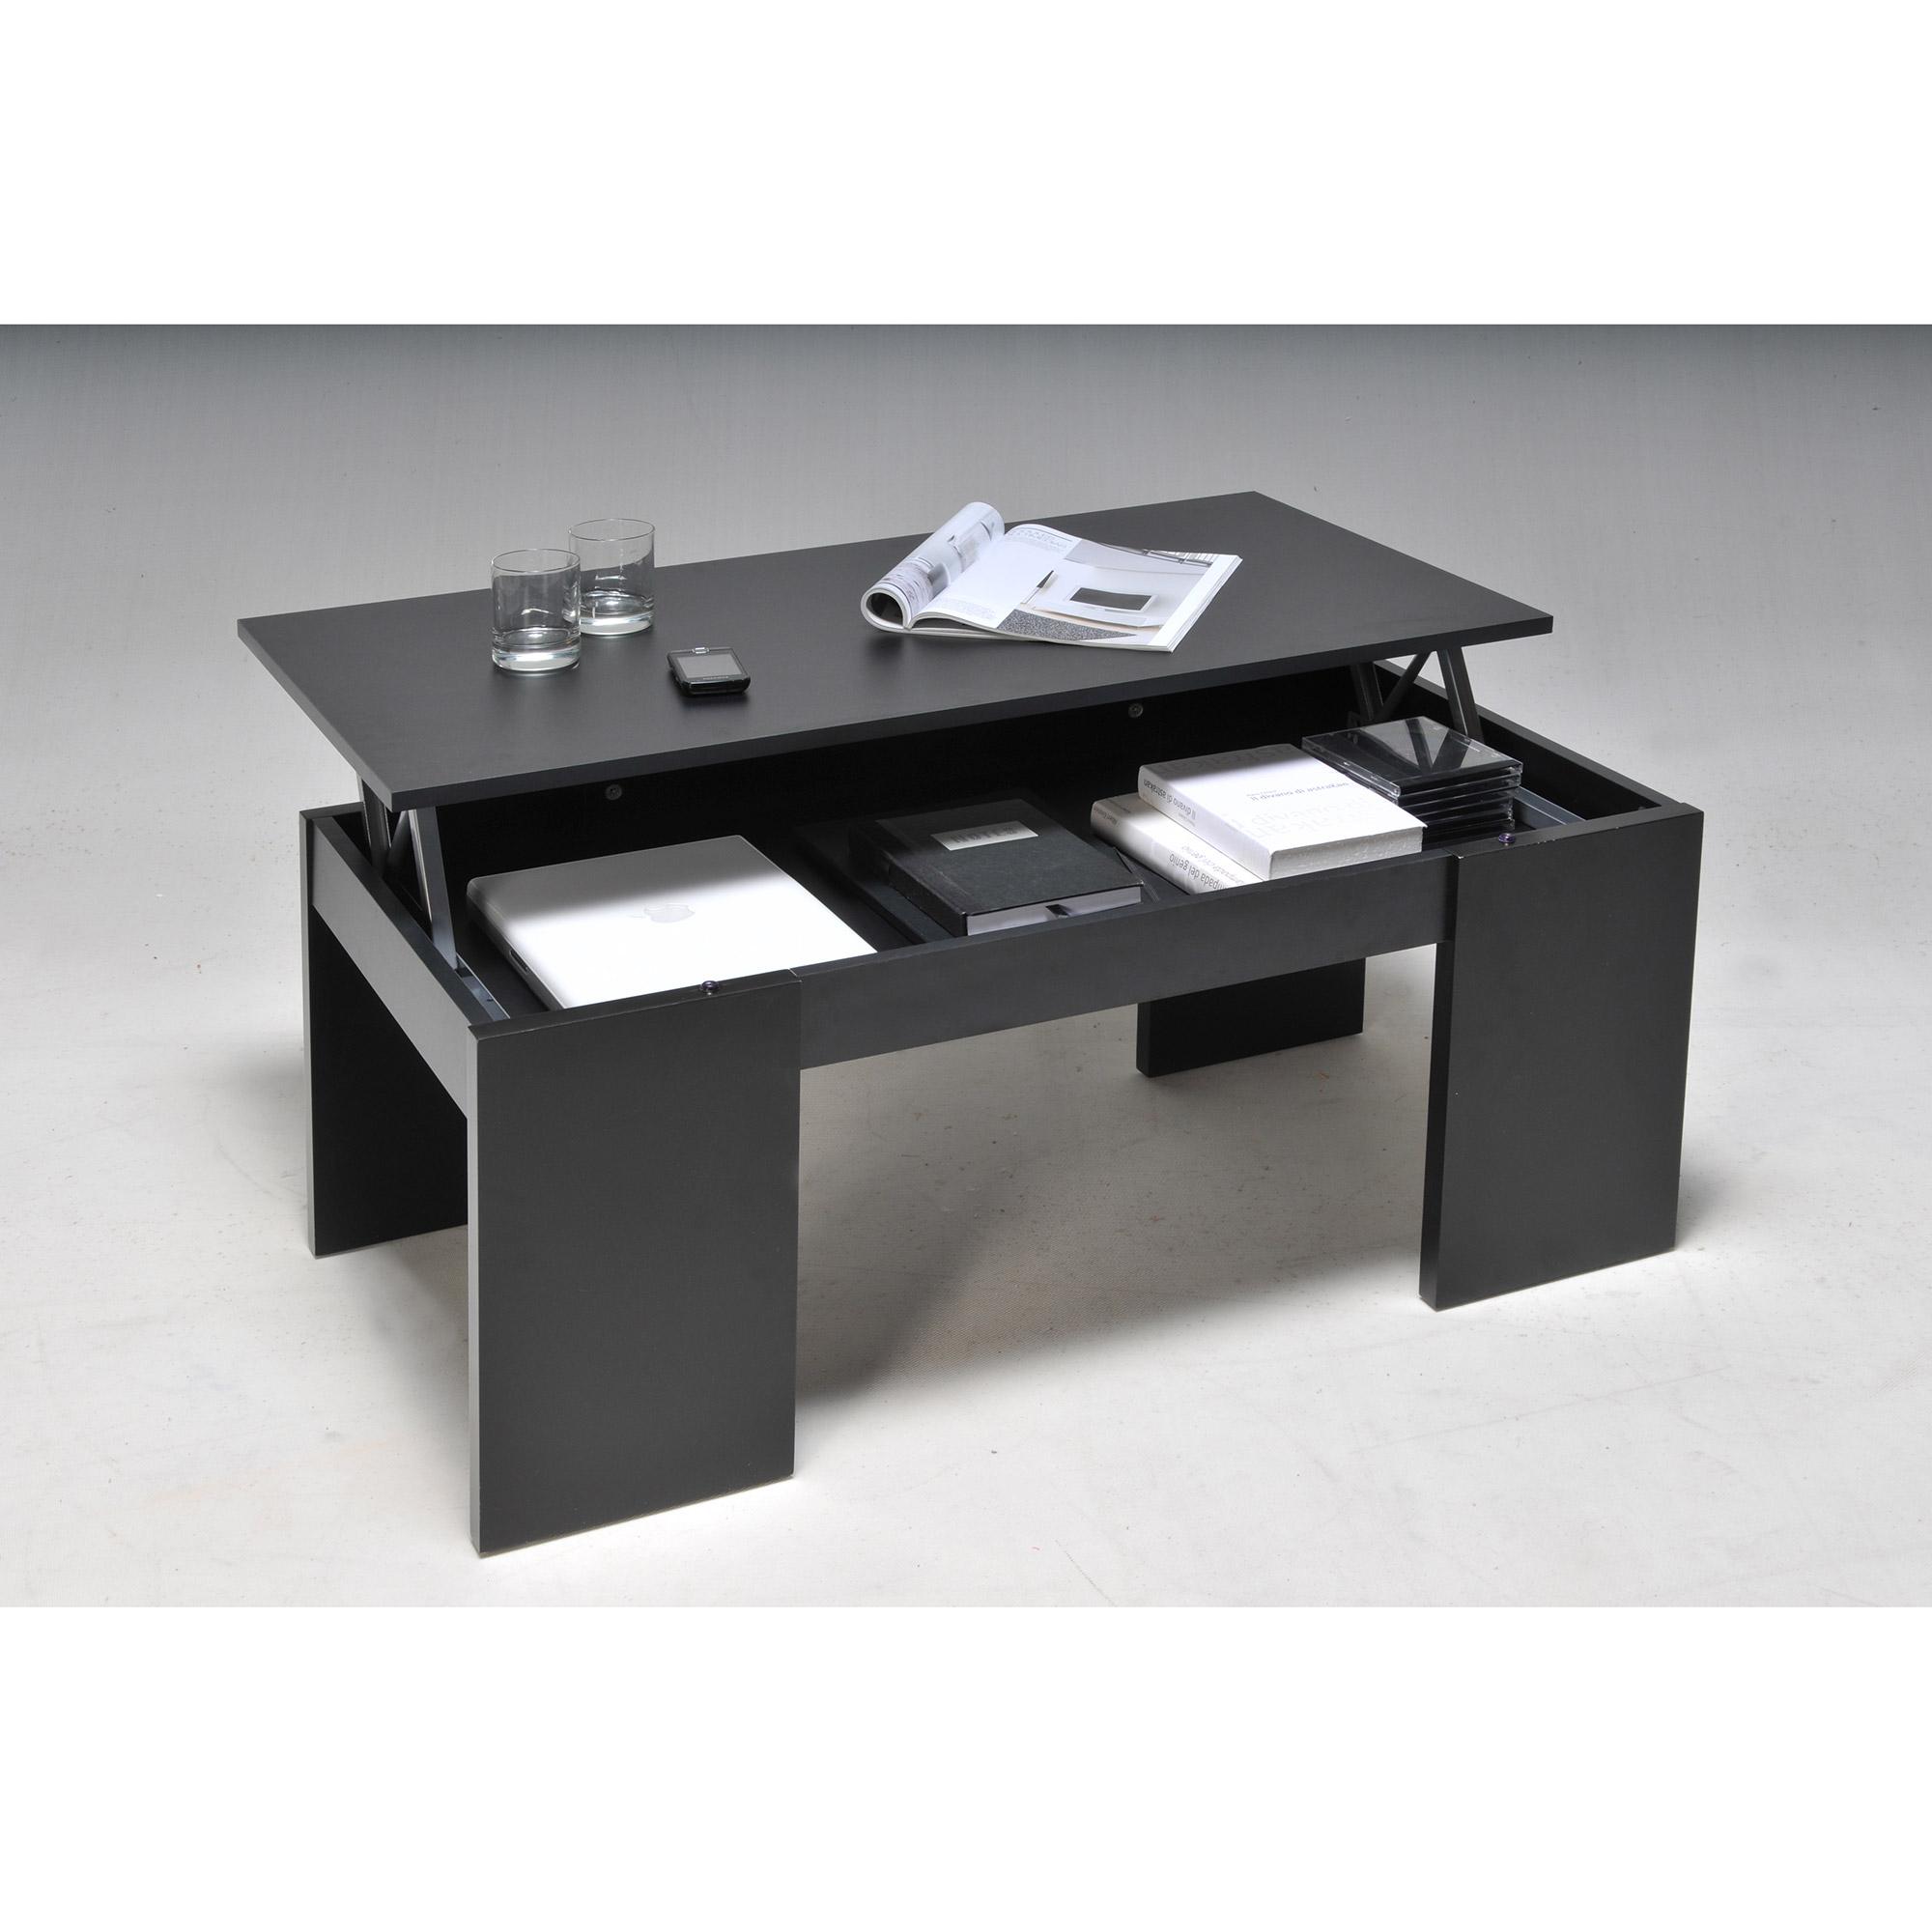 meuble tv rotatif mobilier design d coration d 39 int rieur. Black Bedroom Furniture Sets. Home Design Ideas